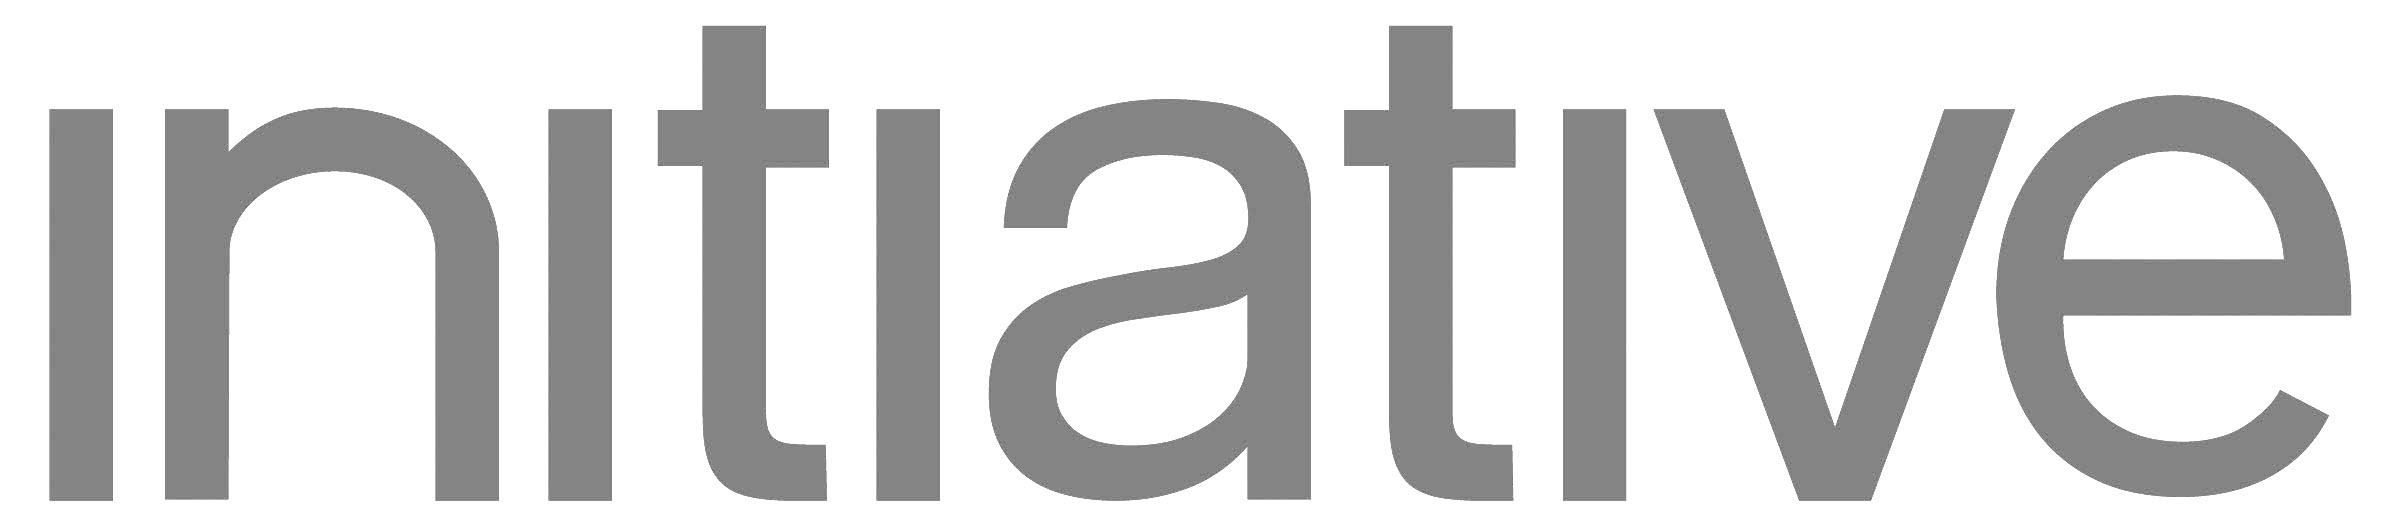 logo-Initiative1.jpg